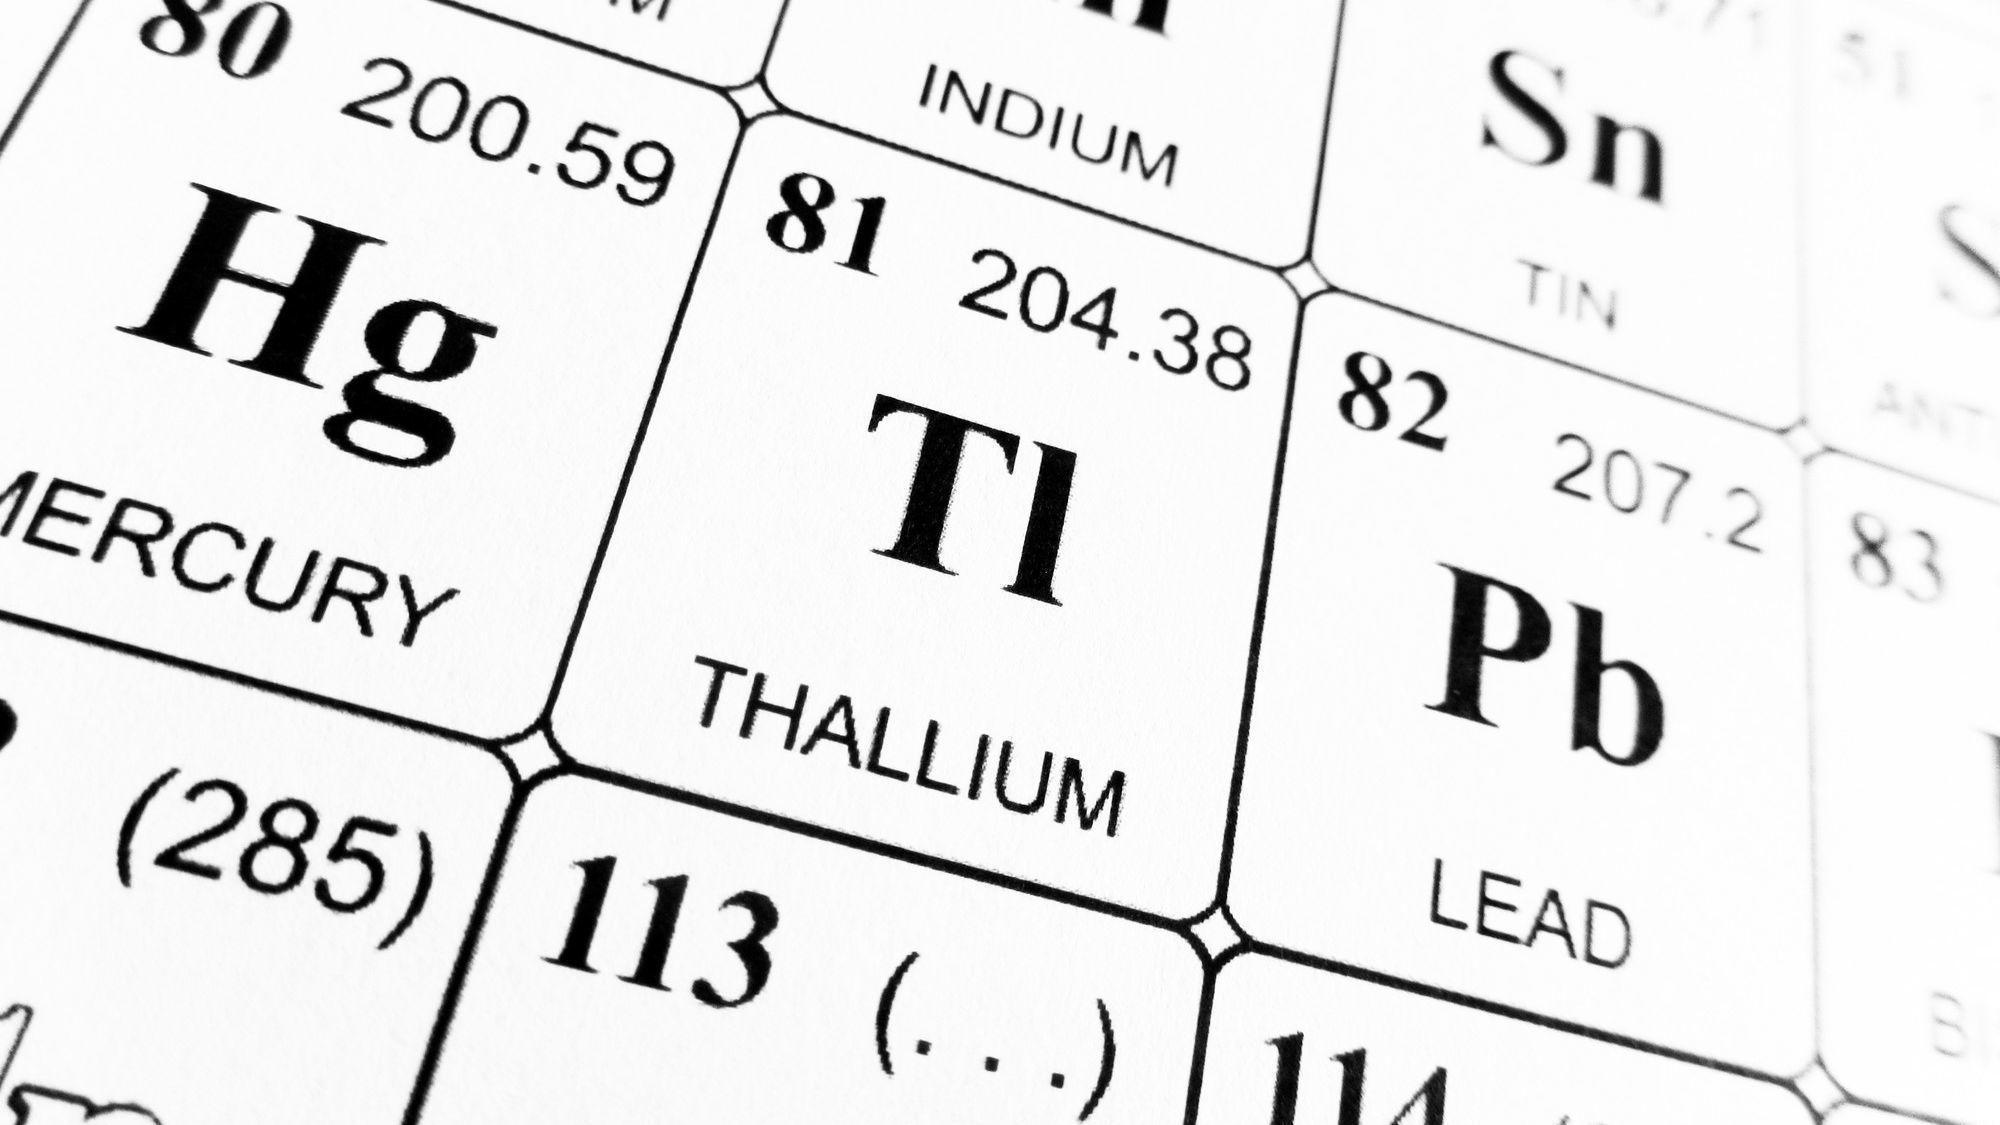 back to natural health thallium.jpg